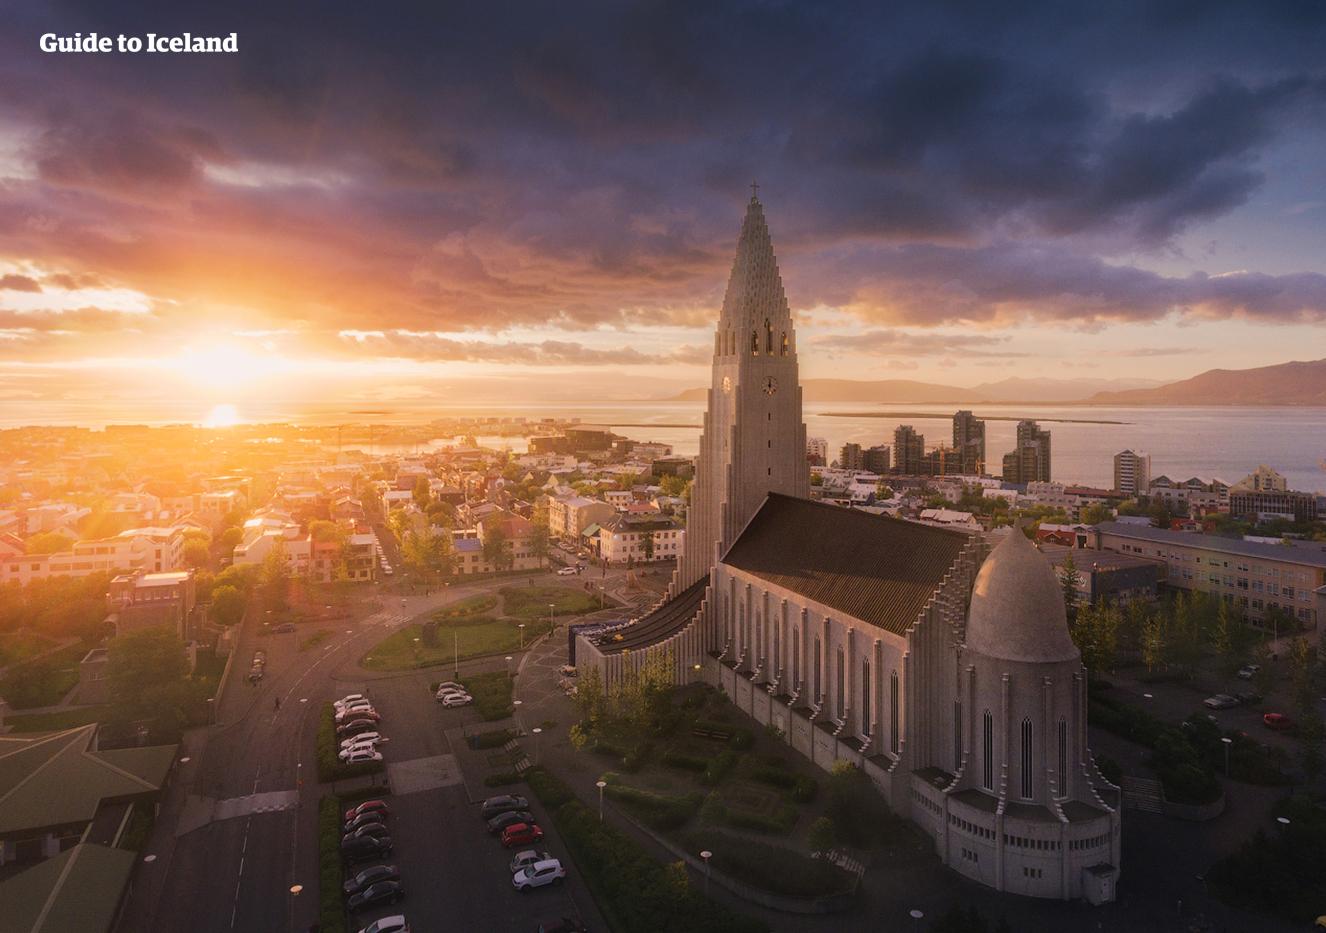 Автотур «Игра престолов» | Исландия за 10 дней - day 9